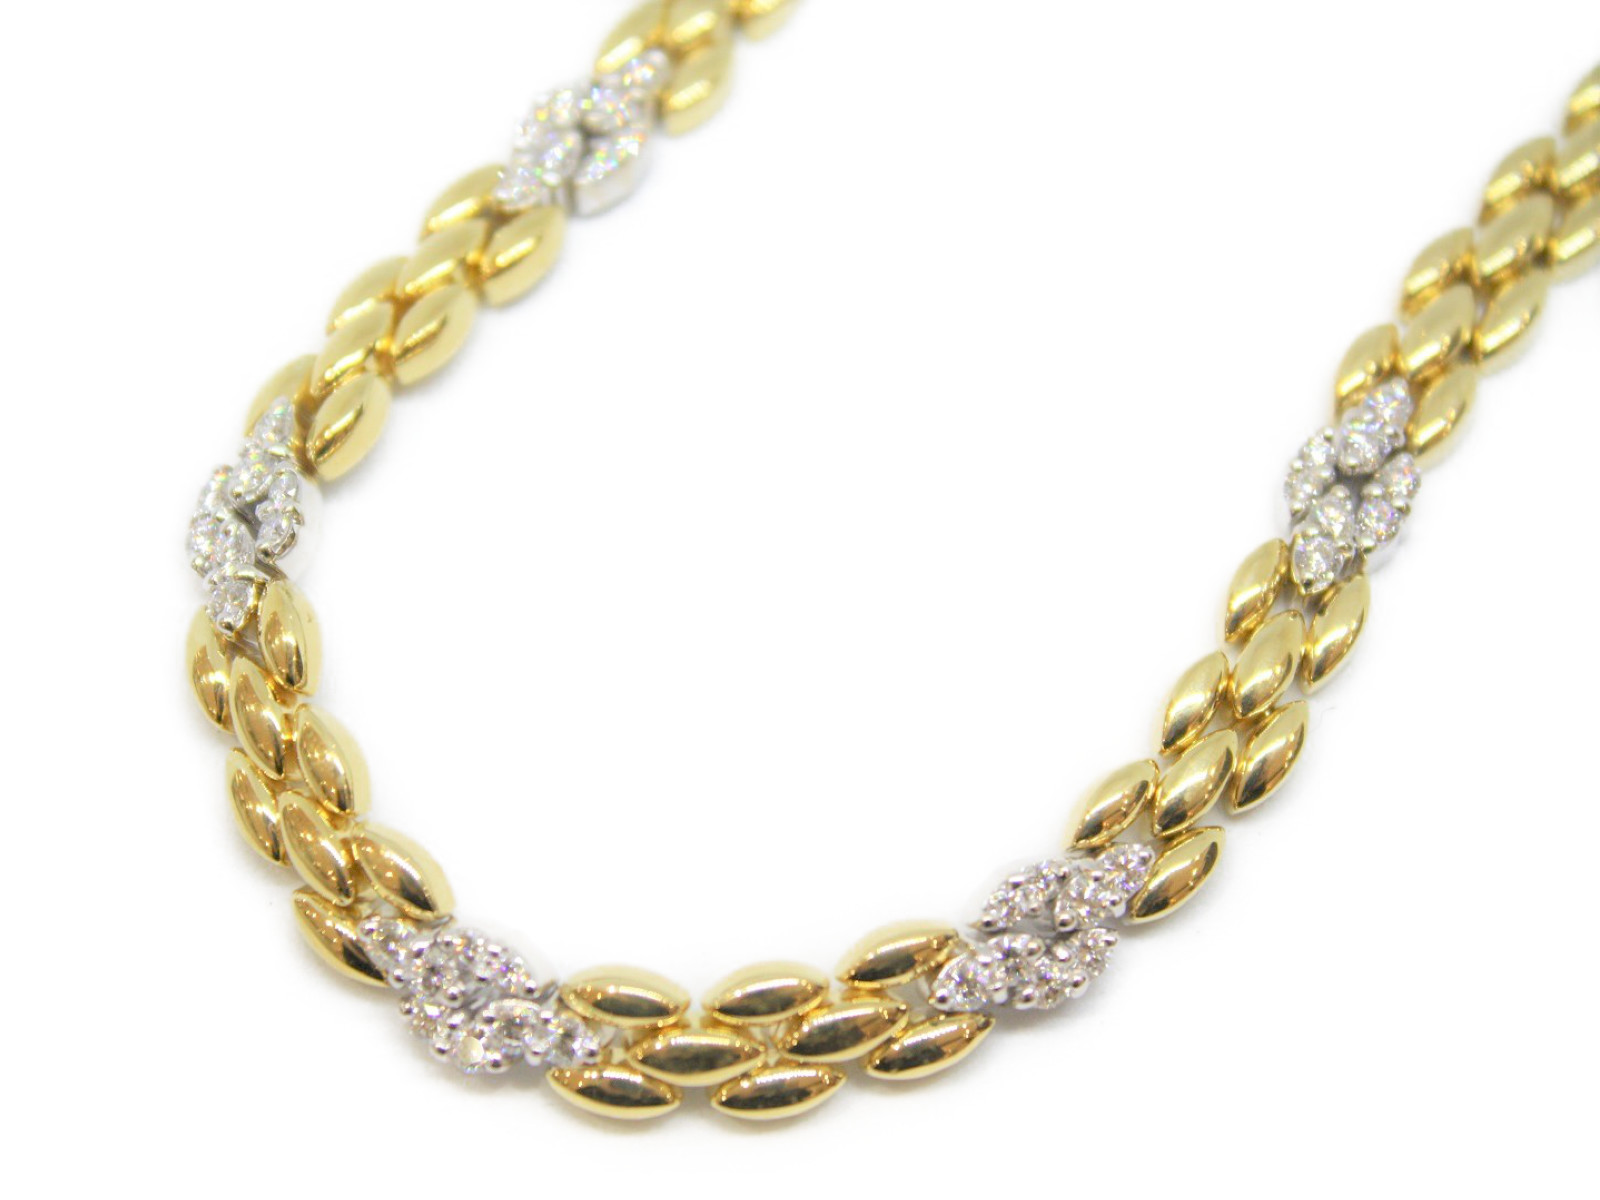 K18 ダイヤモンド デザイン ネックレス750 ダイヤ ペンダントゴージャス 綺麗 キレイ女性 レディース 大人 上品 ジュエリープレゼントにいかがですか?ギフト包装可 【中古】